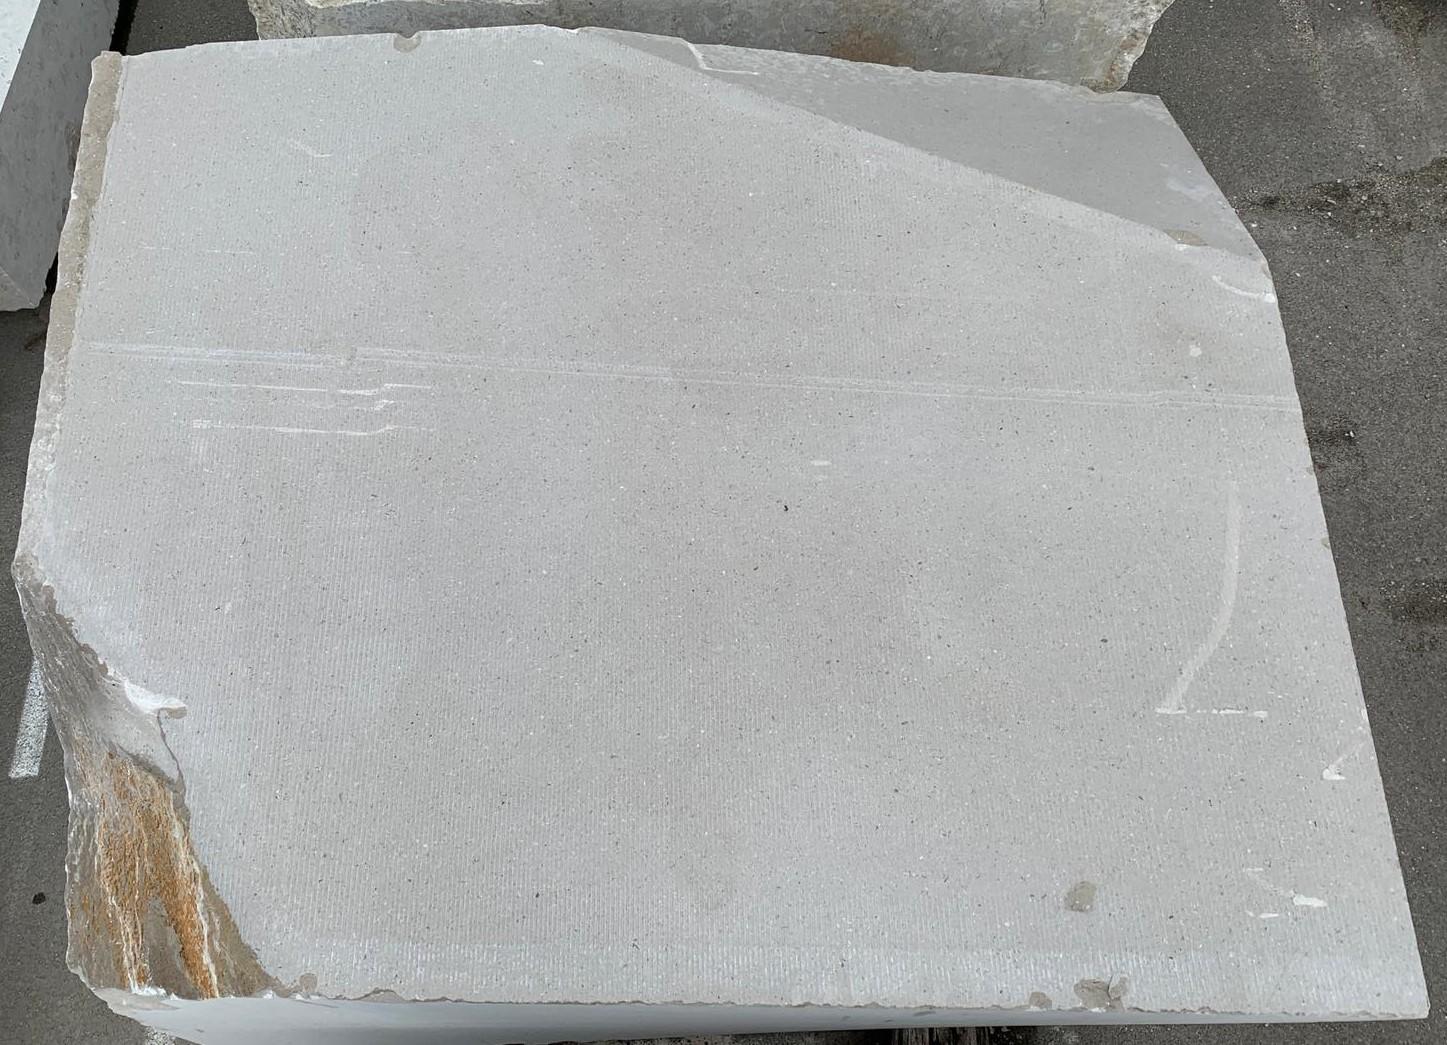 Aurisina Chiara Fioritello blocks